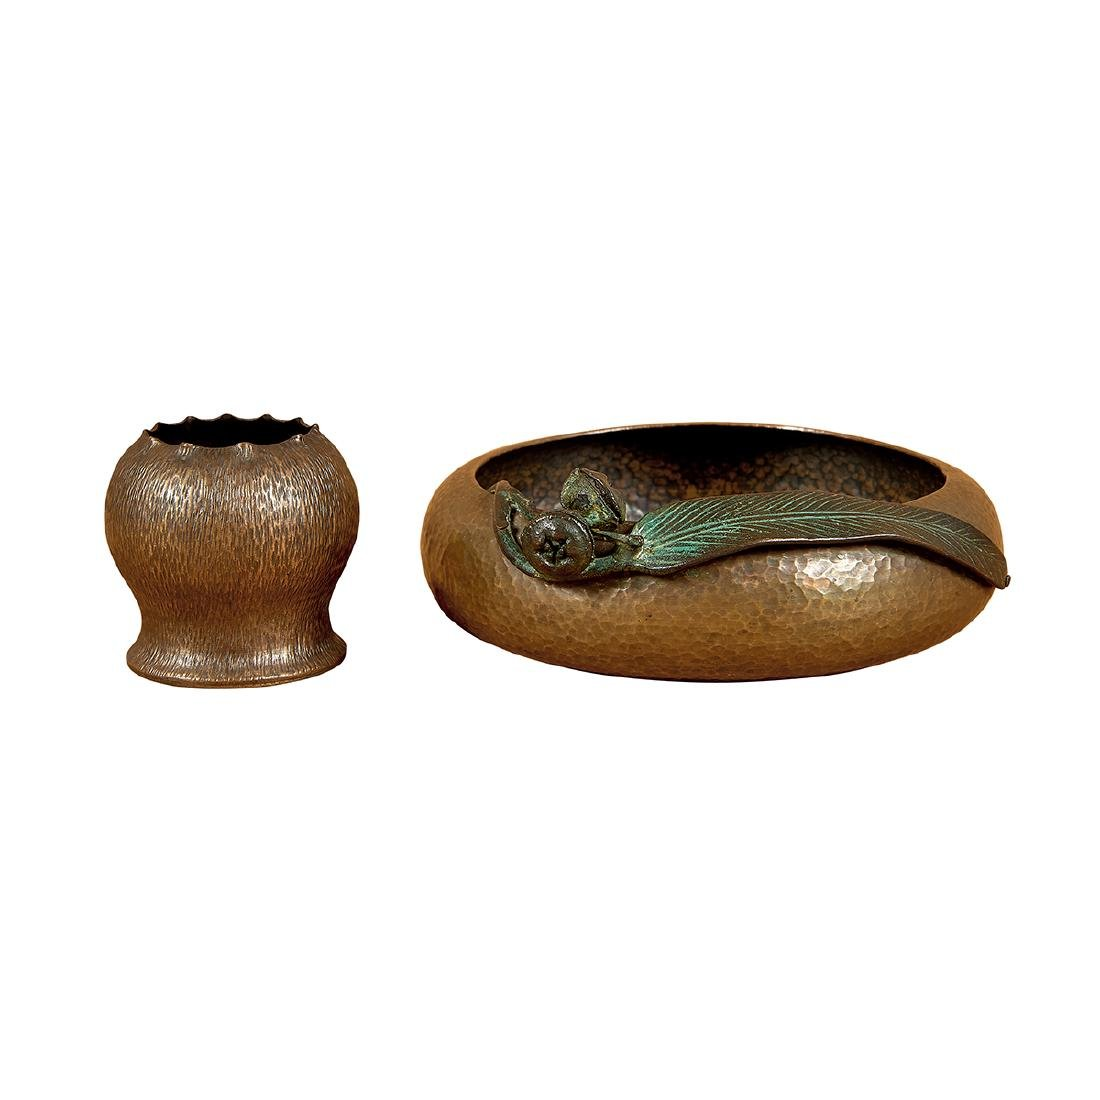 Brosi Ye Olde Copper Shoppe bowl, match holder